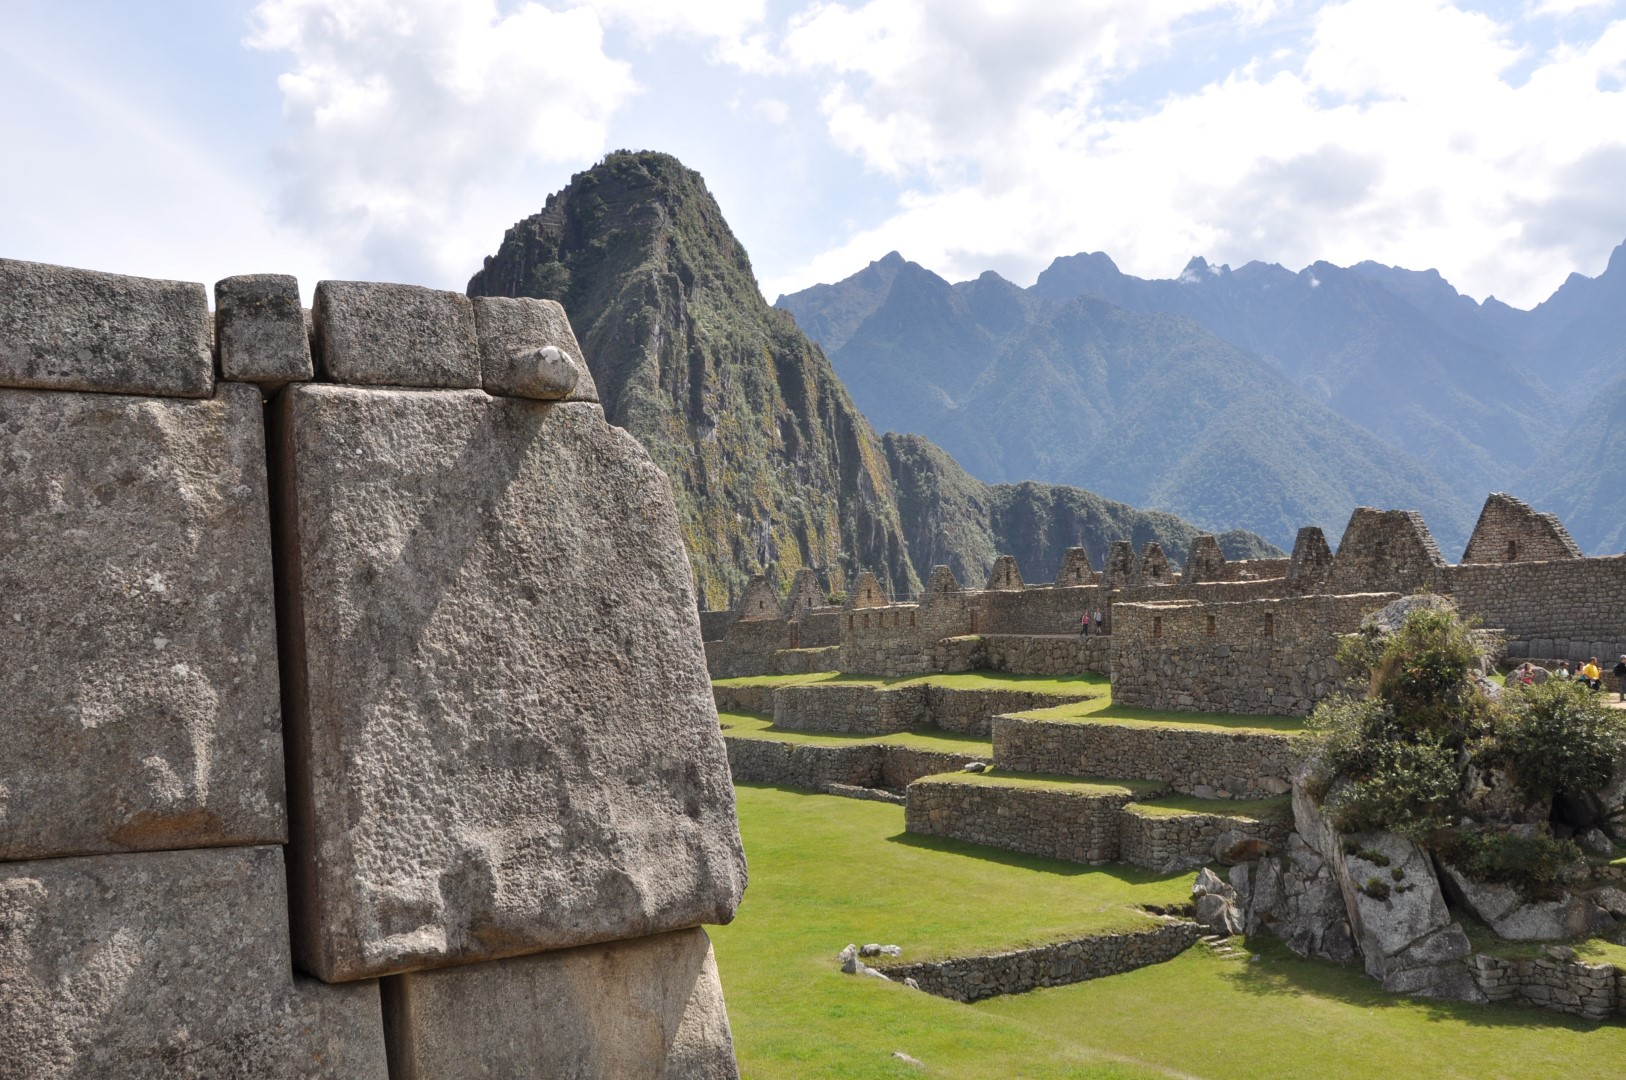 Short Inca trail 2 Days - Hike to Machu Picchu